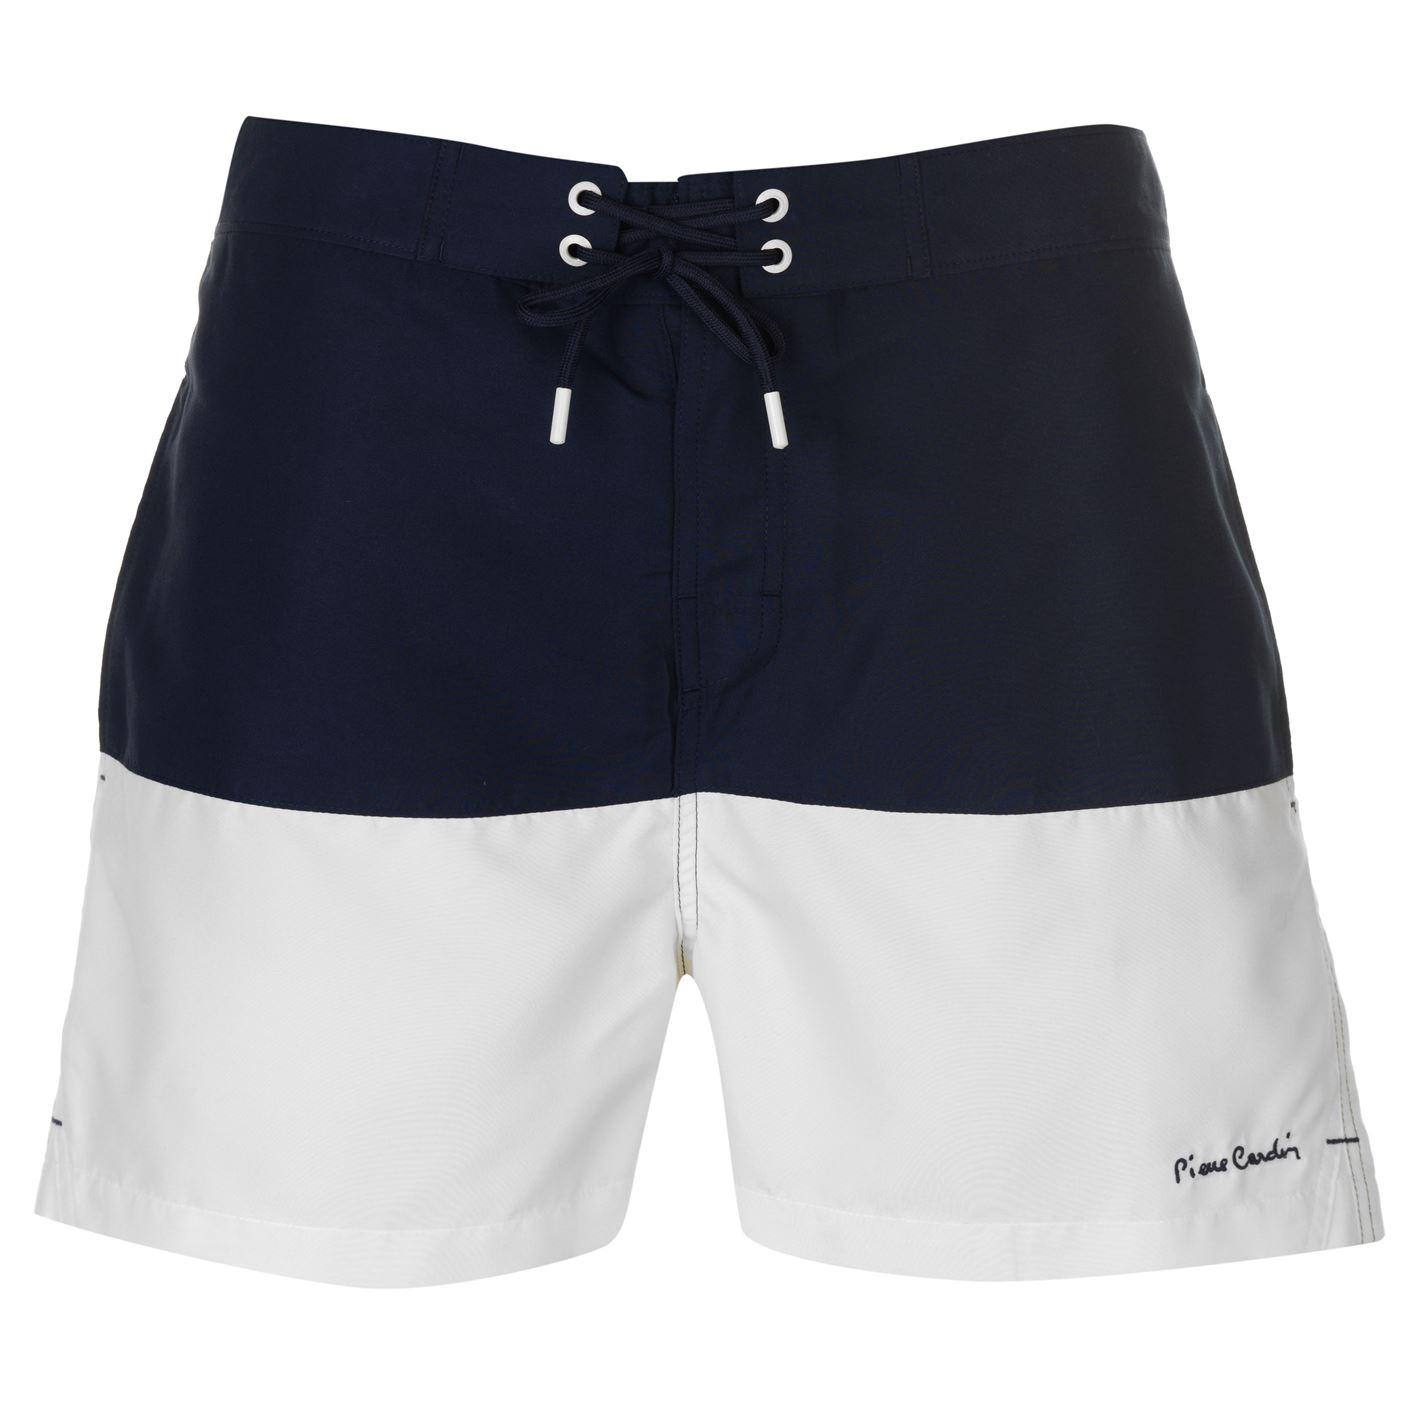 Pierre Cardin Cut and Sew Swim Shorts Mens